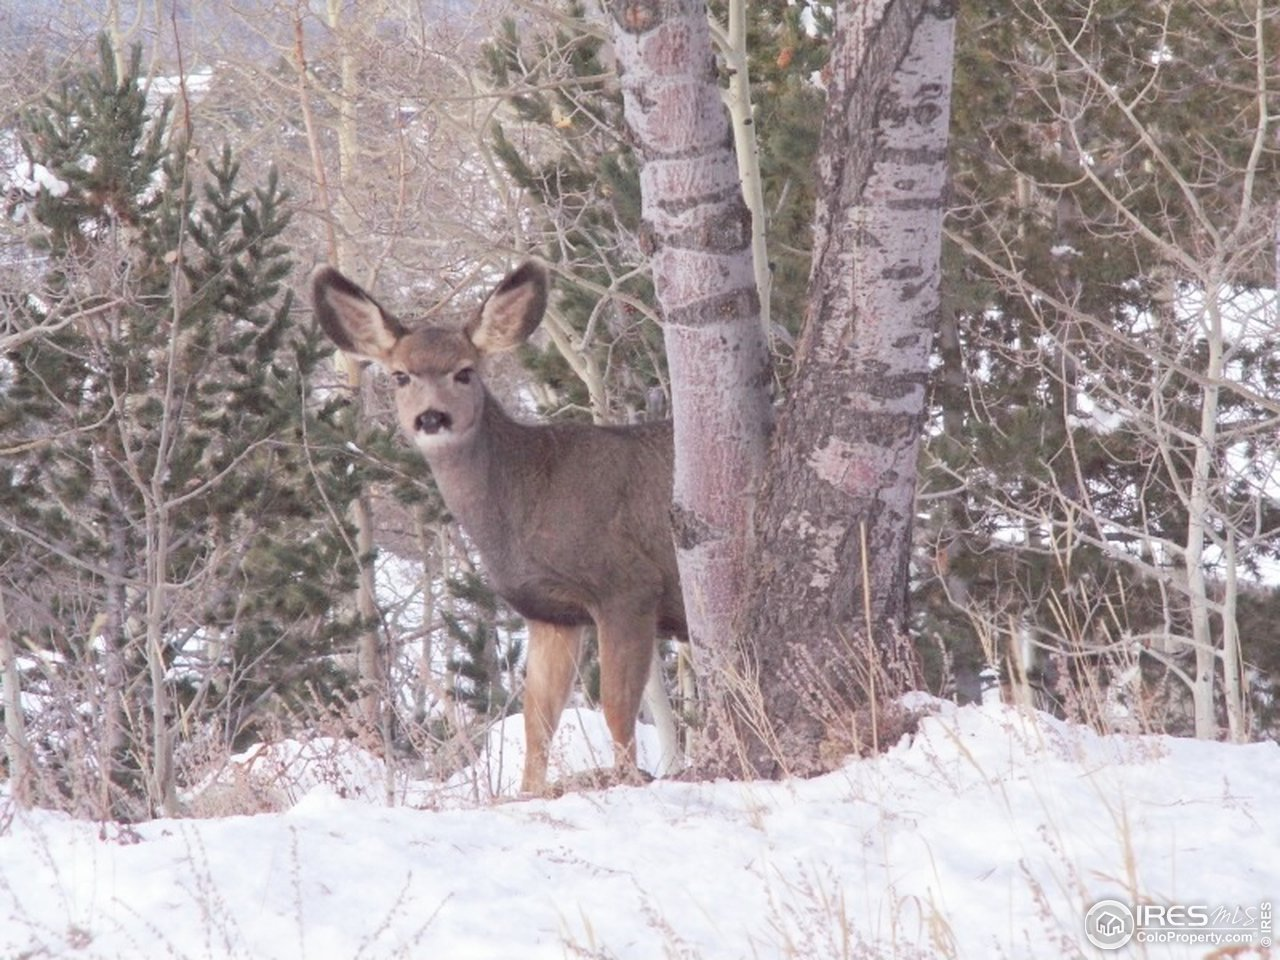 Plenty of wildlife frequent the property